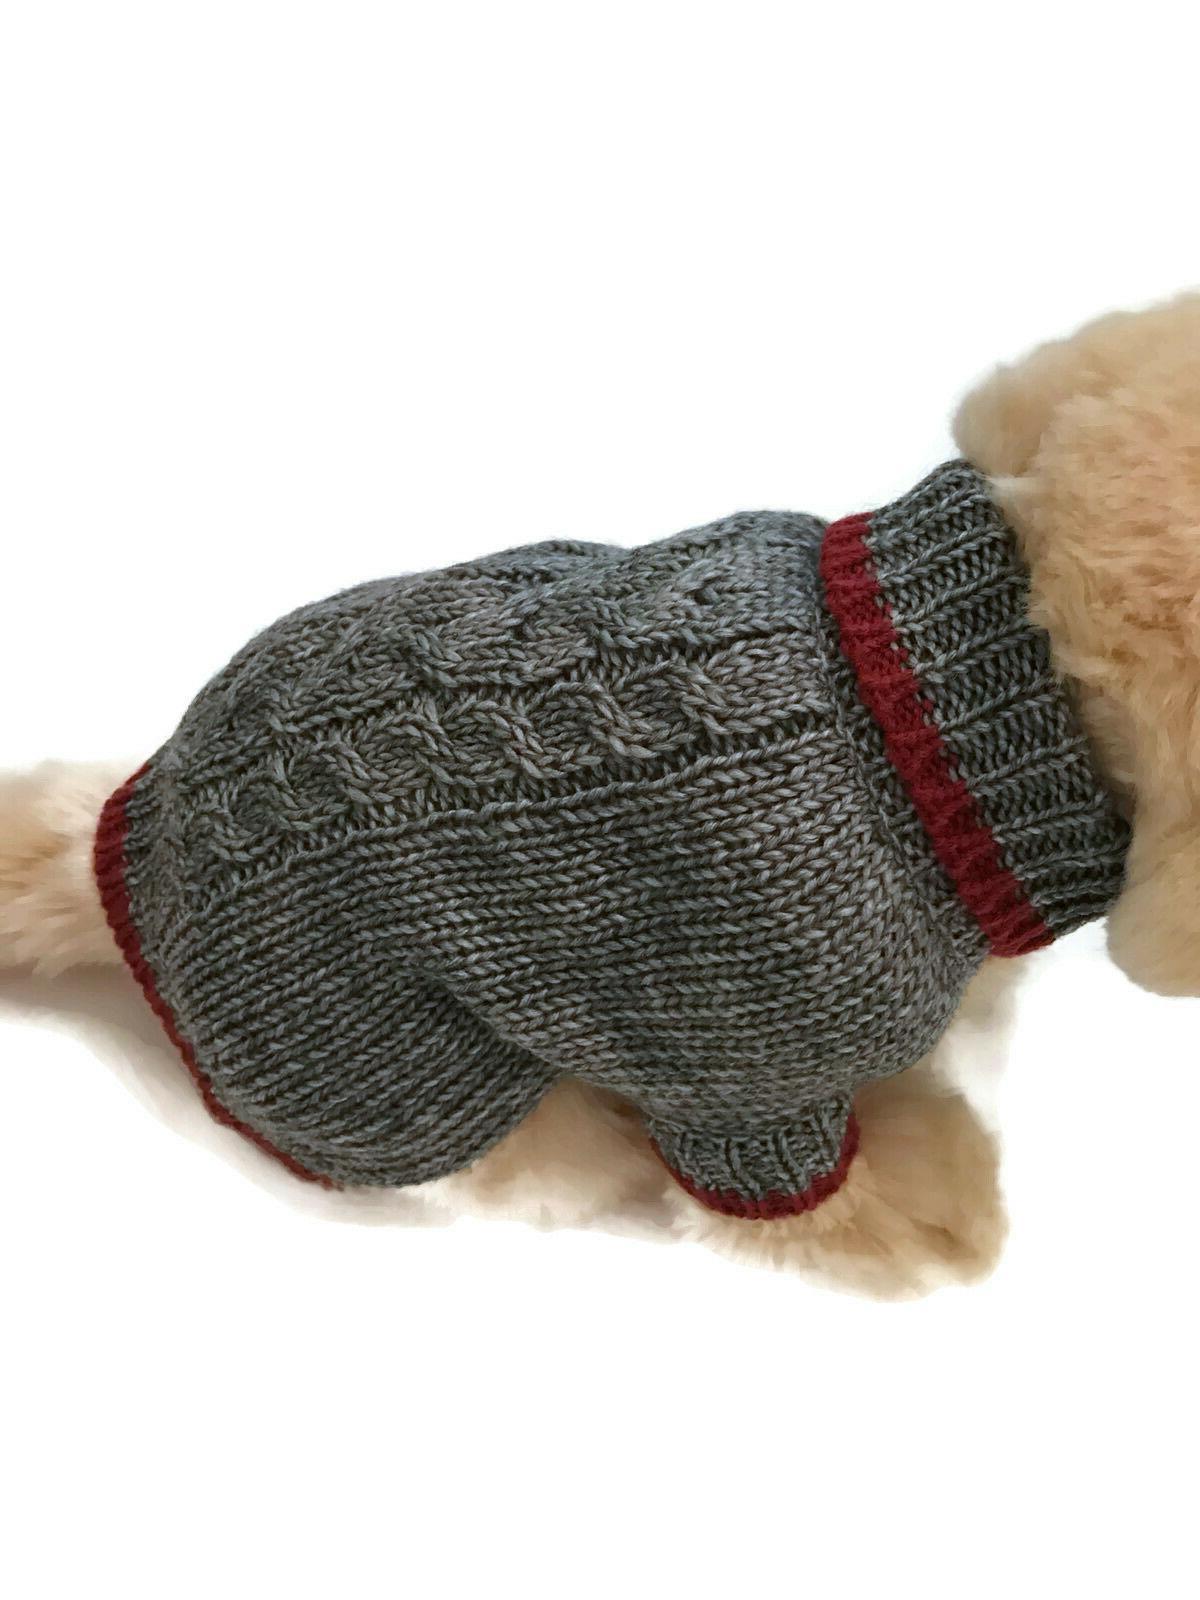 Le Small Dog Sweater